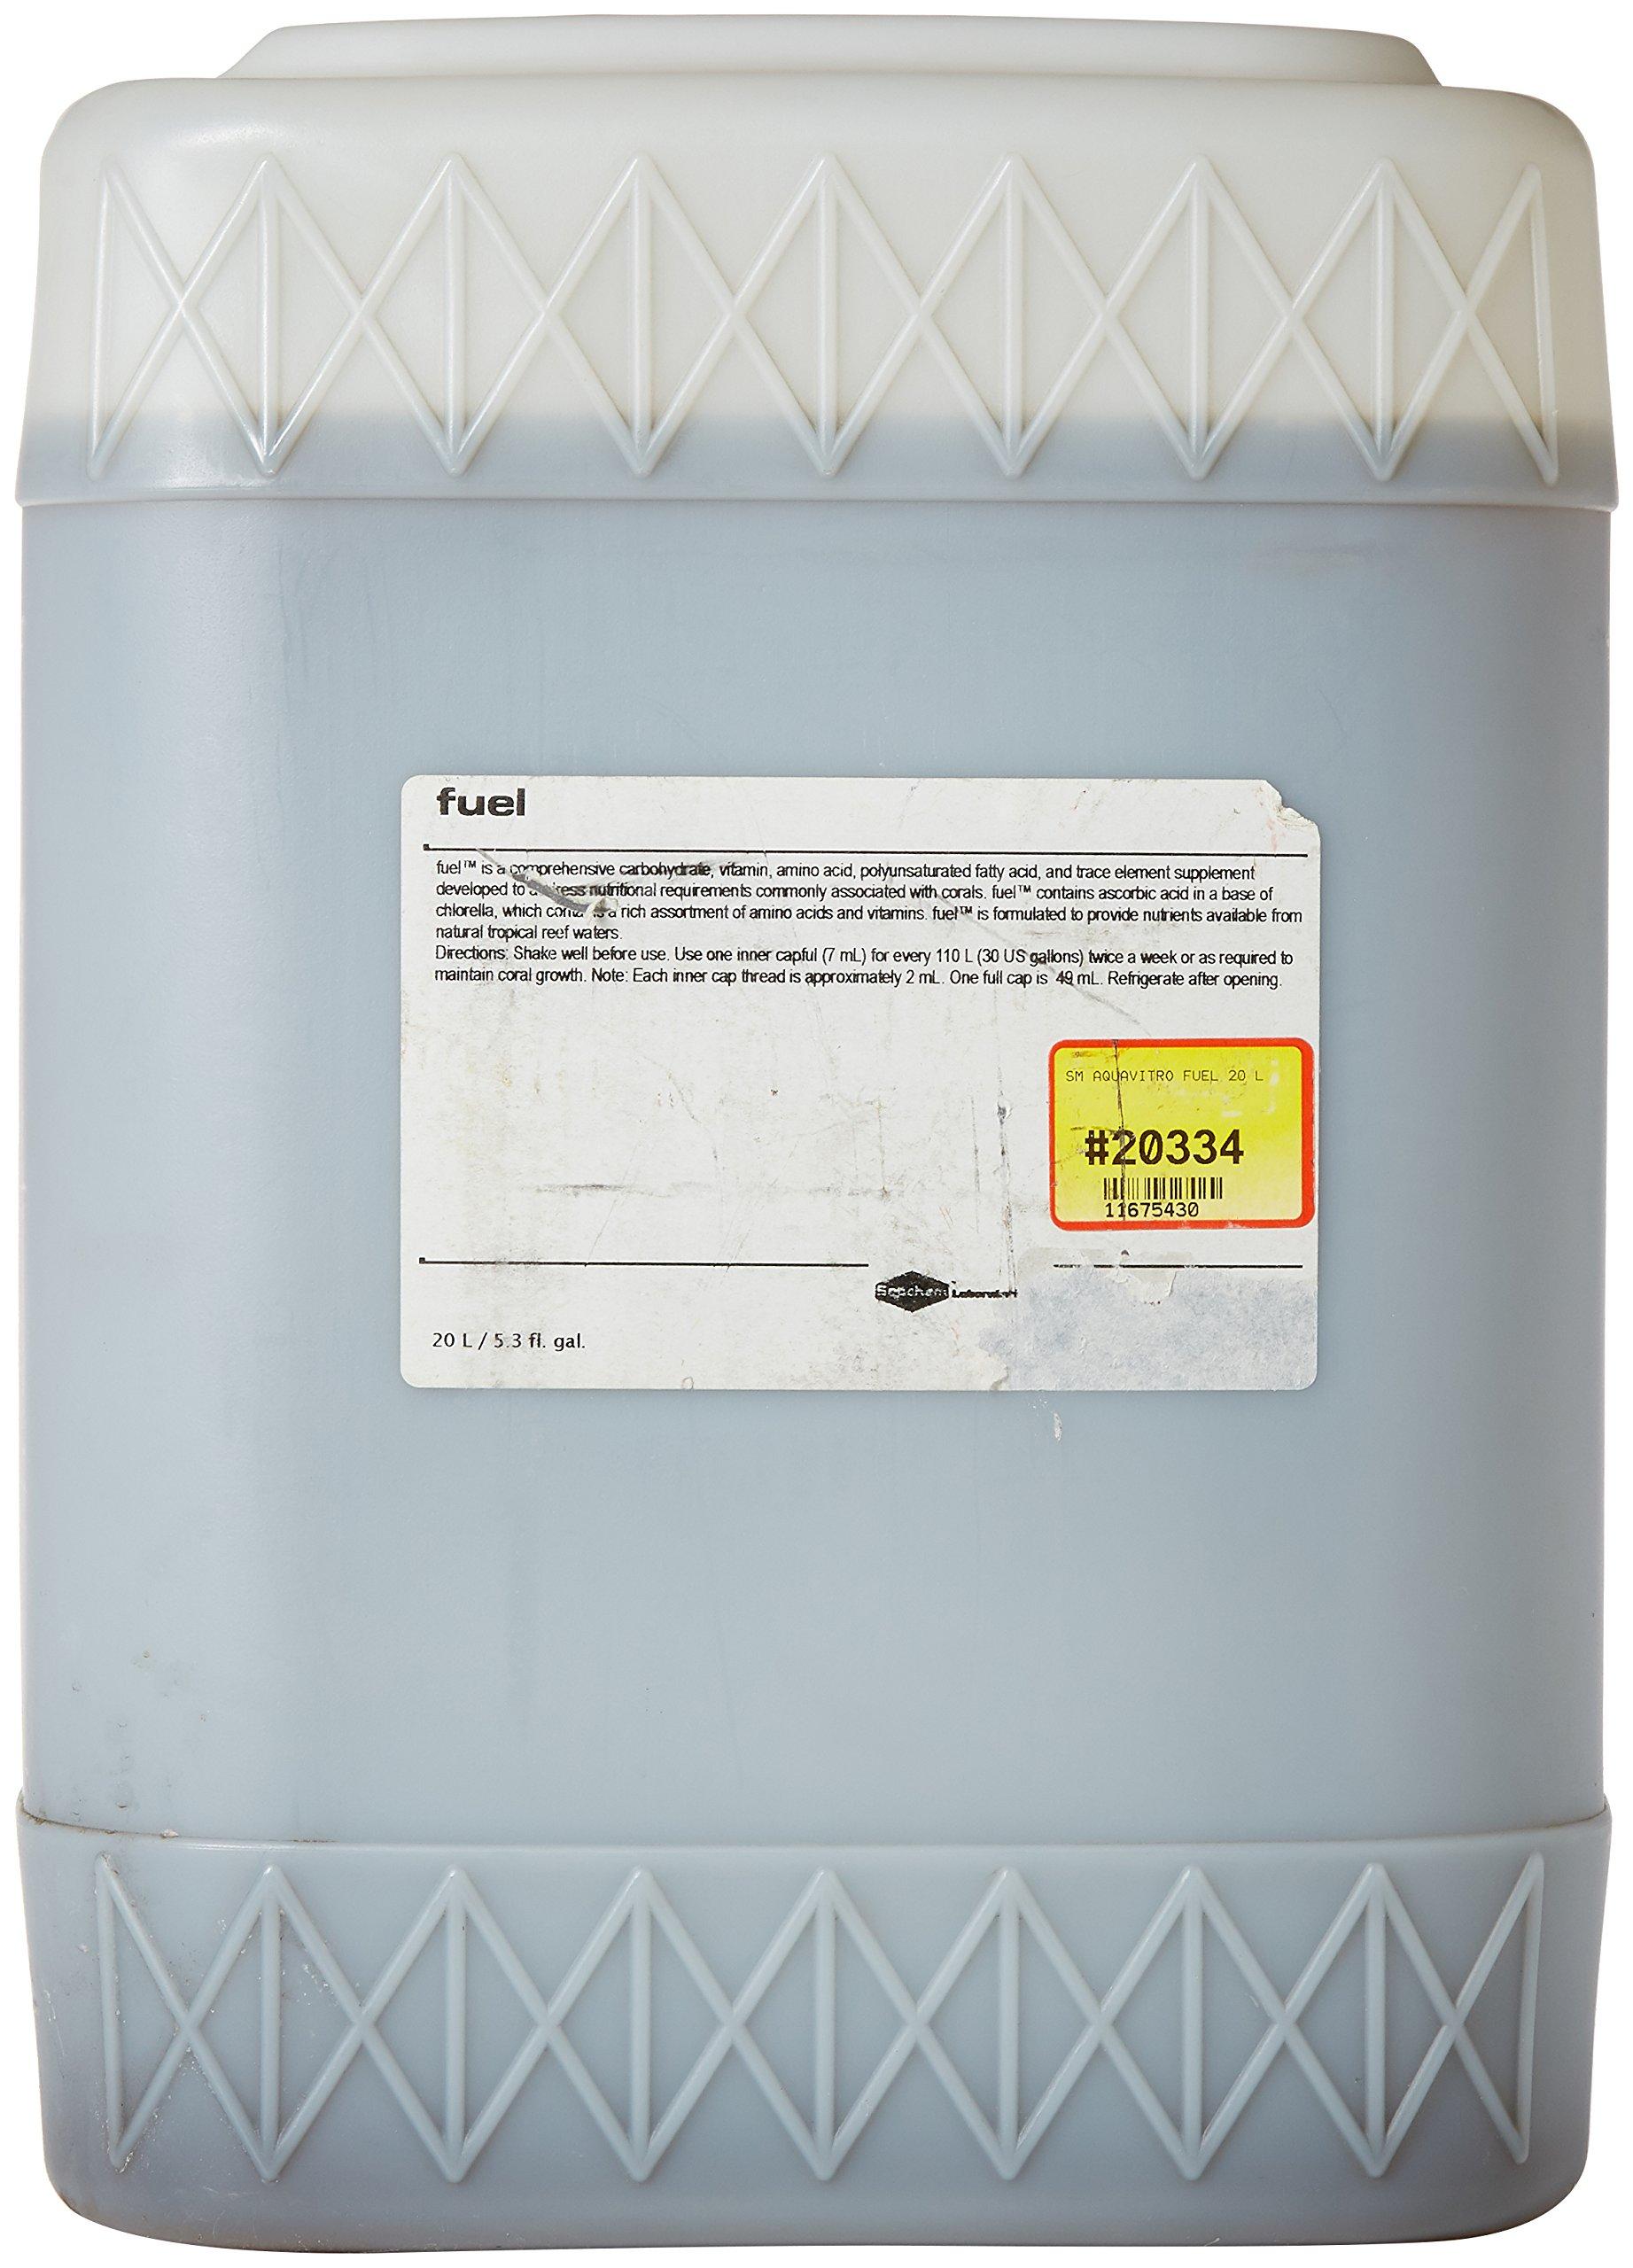 aquavitro 20334 Fuel, 20 L